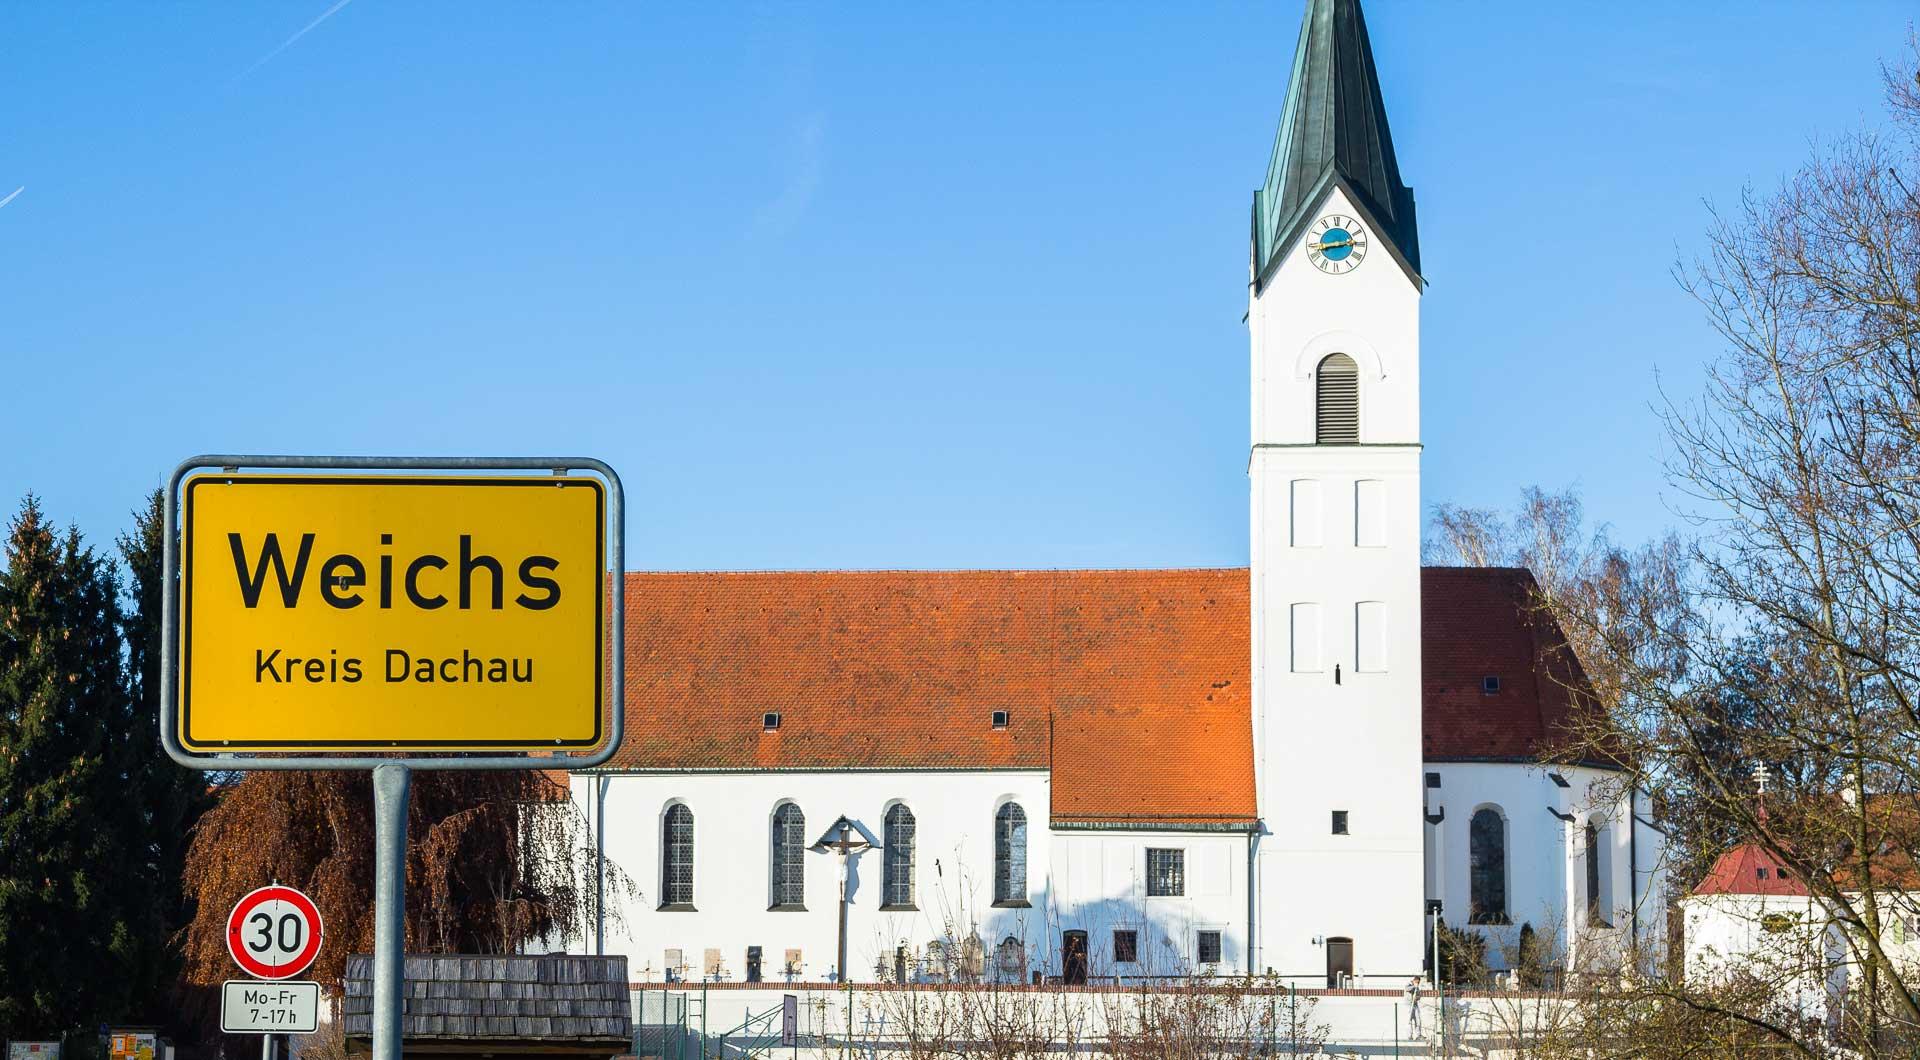 Weichs in der Region Dachau